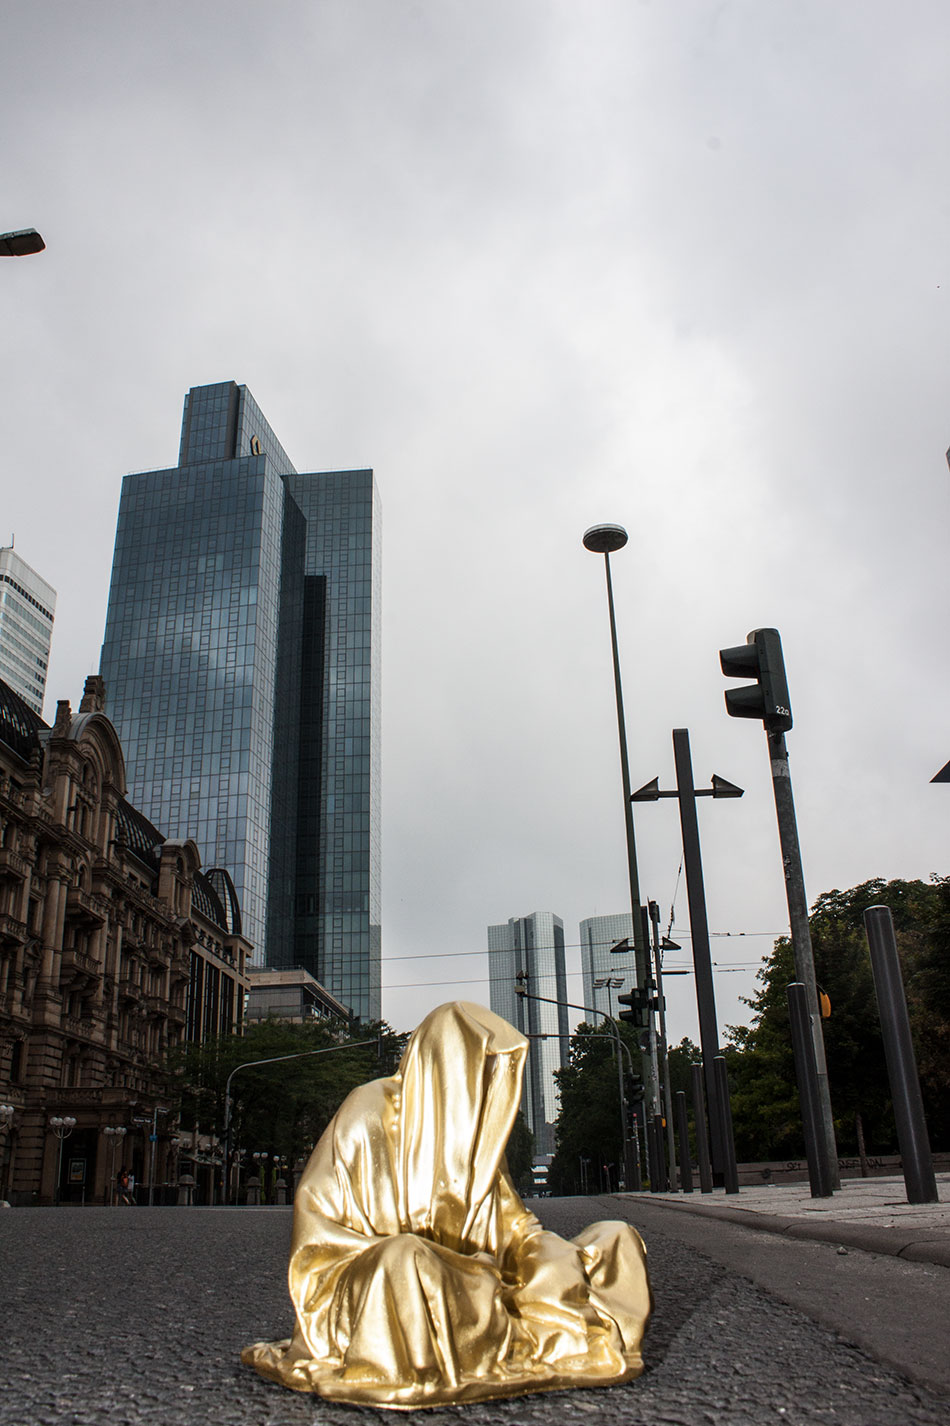 art-germany-frankfurt-guardians-of-time-manfred-kielnhofer-public-modern-contemporary-art-fine-arts-sculpture-design-streat-art-2191